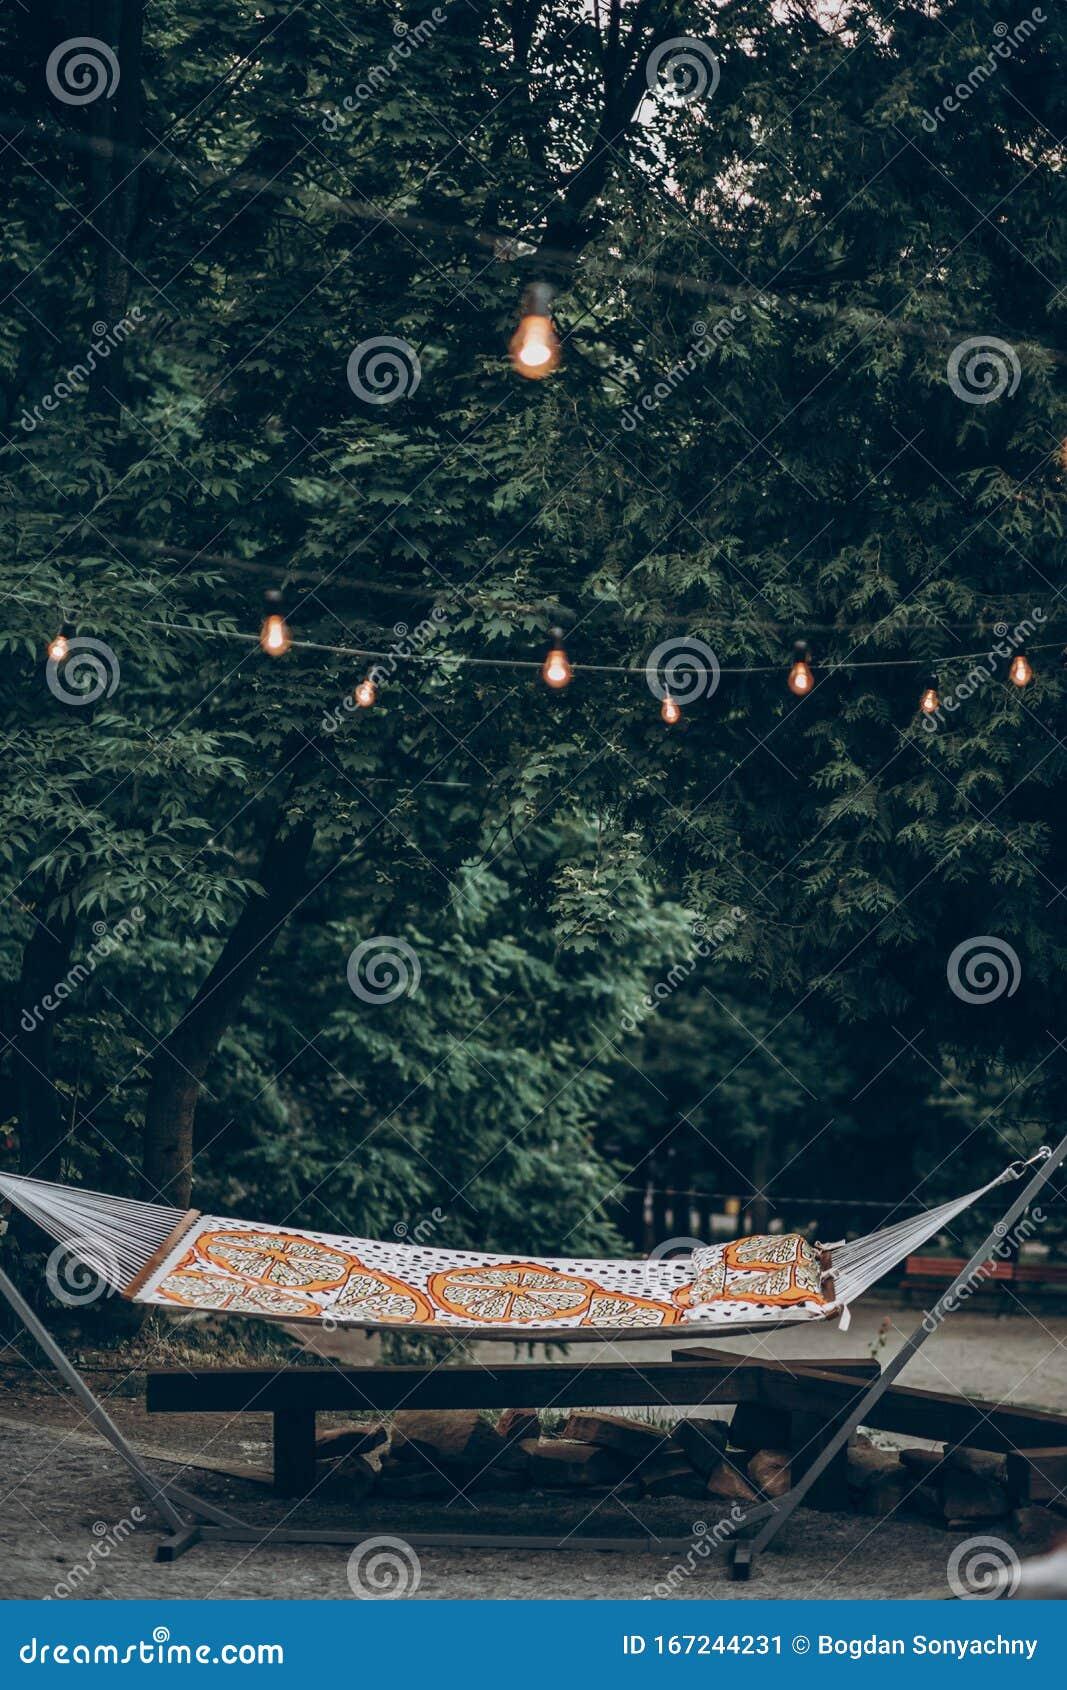 Stylish Hipster Hammock Under Romantic Lights In Park At ...